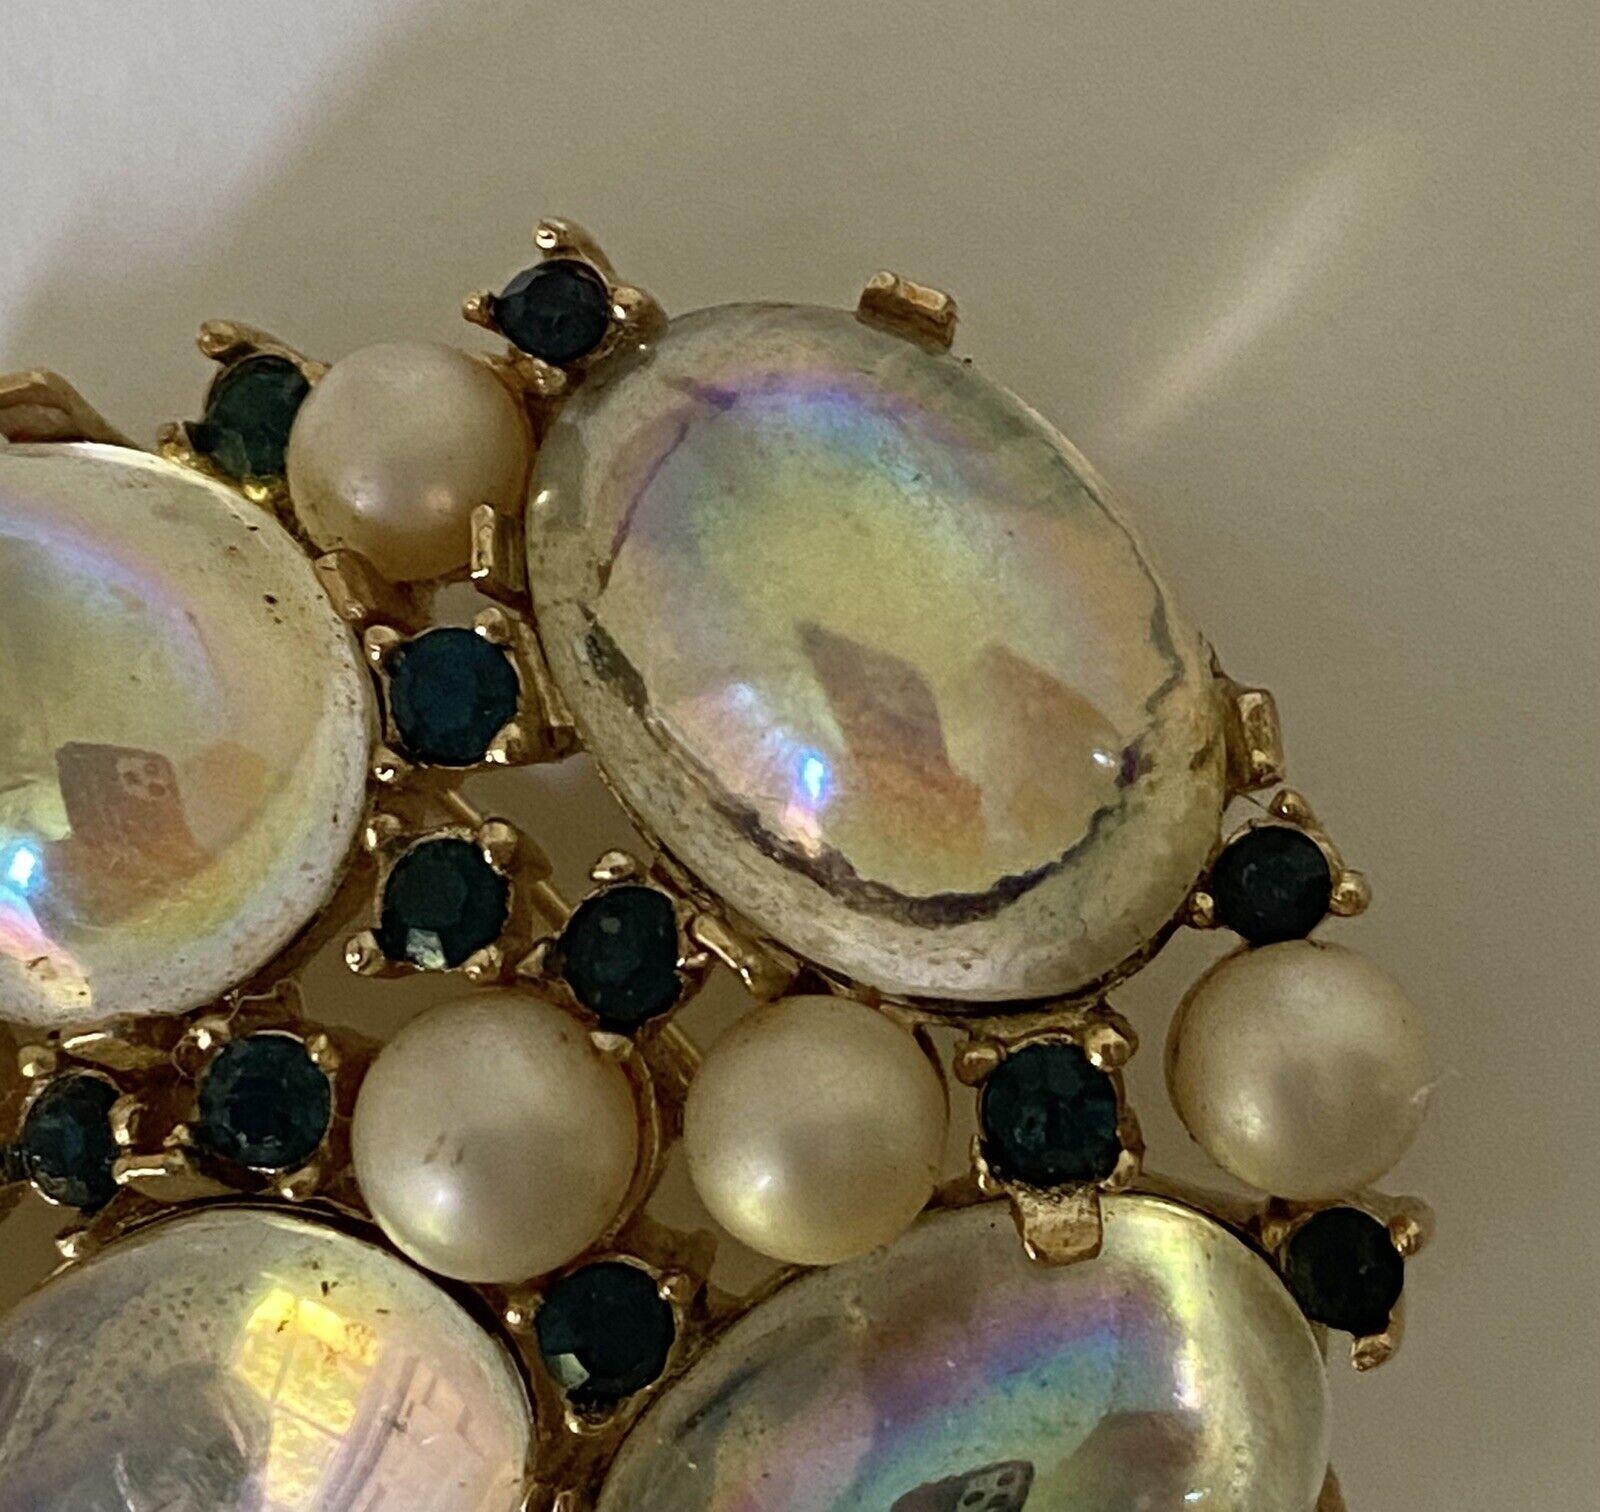 Trifari Sapphire & Pearl Brooch 1950s/60s - image 6